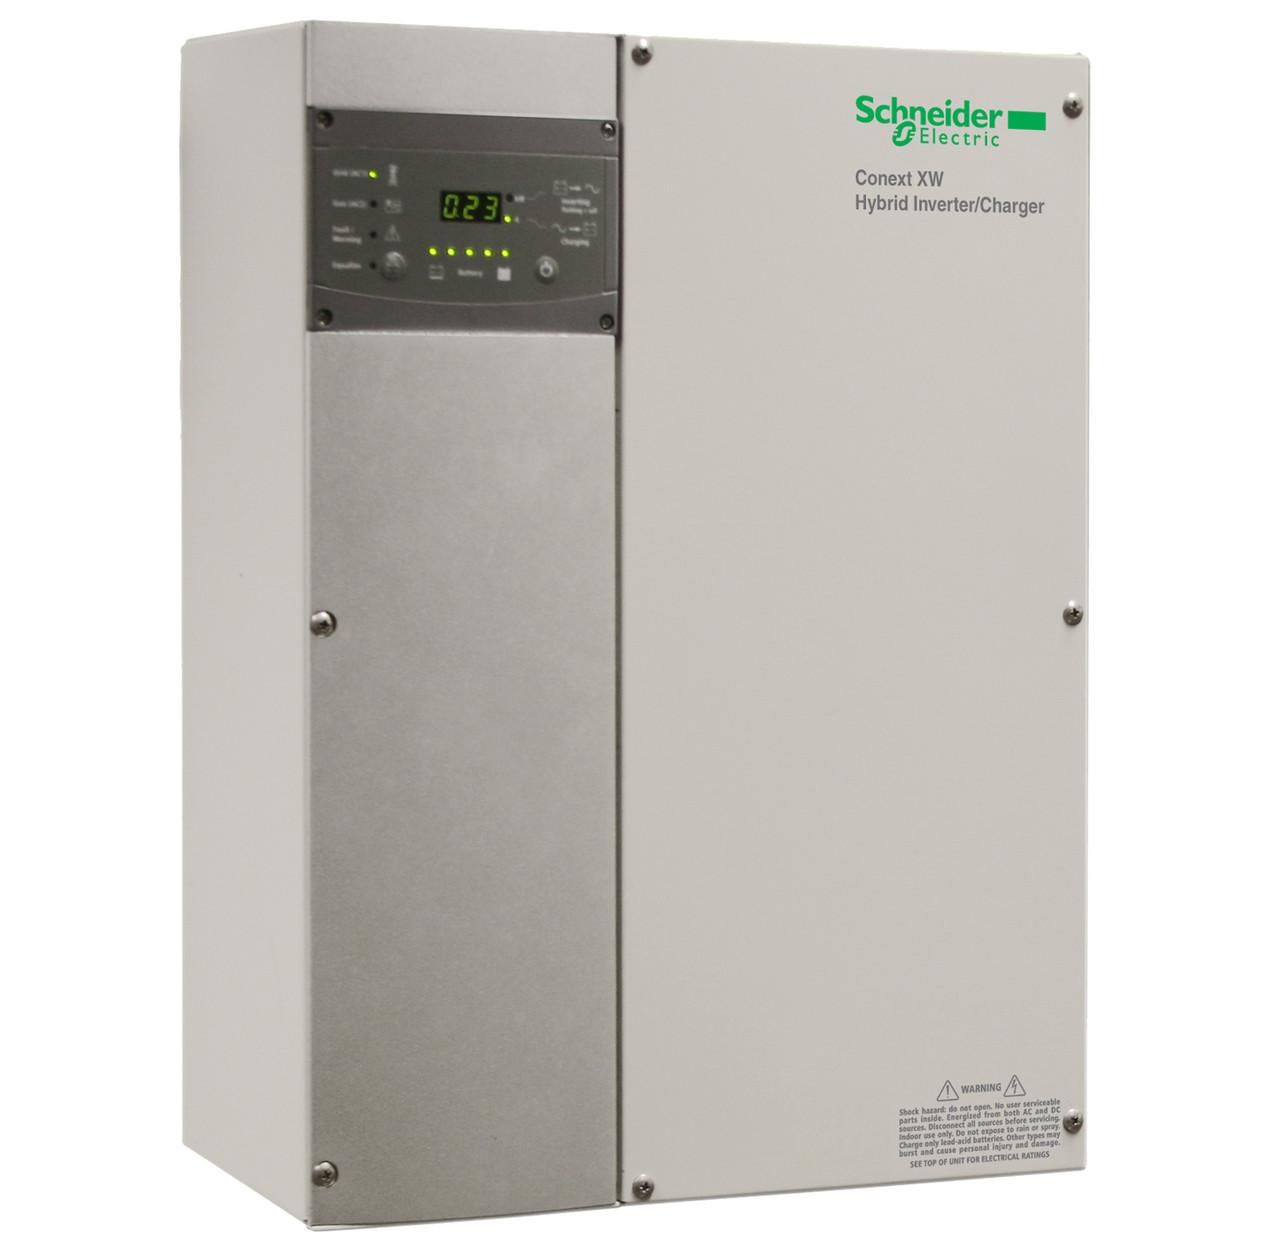 Schneider electric conext xw4548 120240 60 4500w battery inverter loading zoom swarovskicordoba Gallery